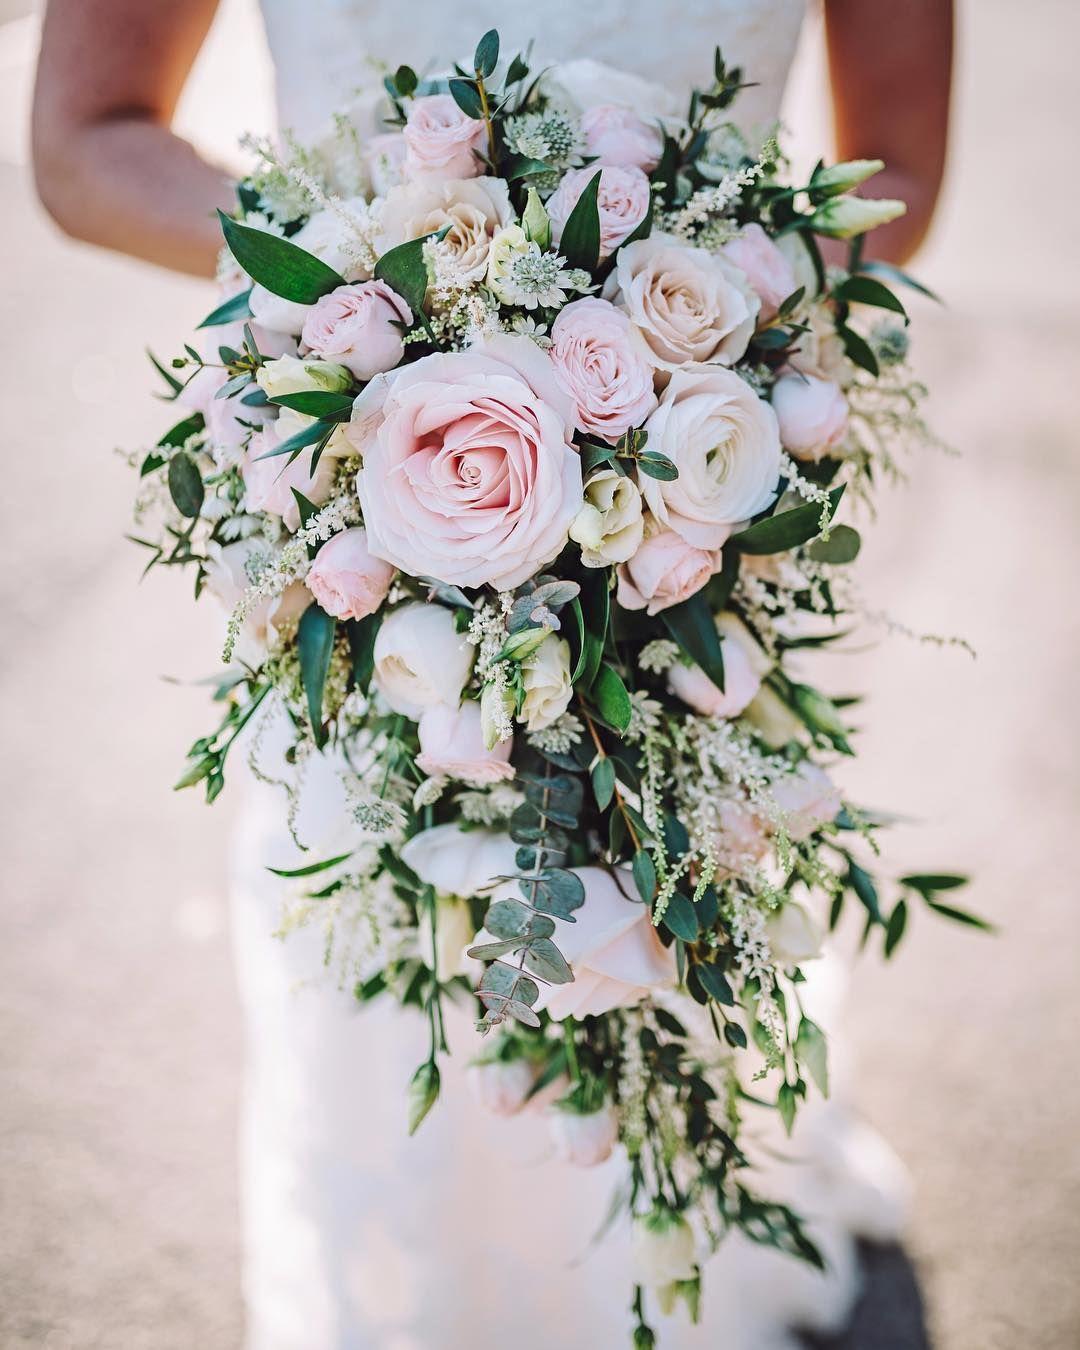 Pin By Maggie's Custom Designs On Wedding Flowers In 2019